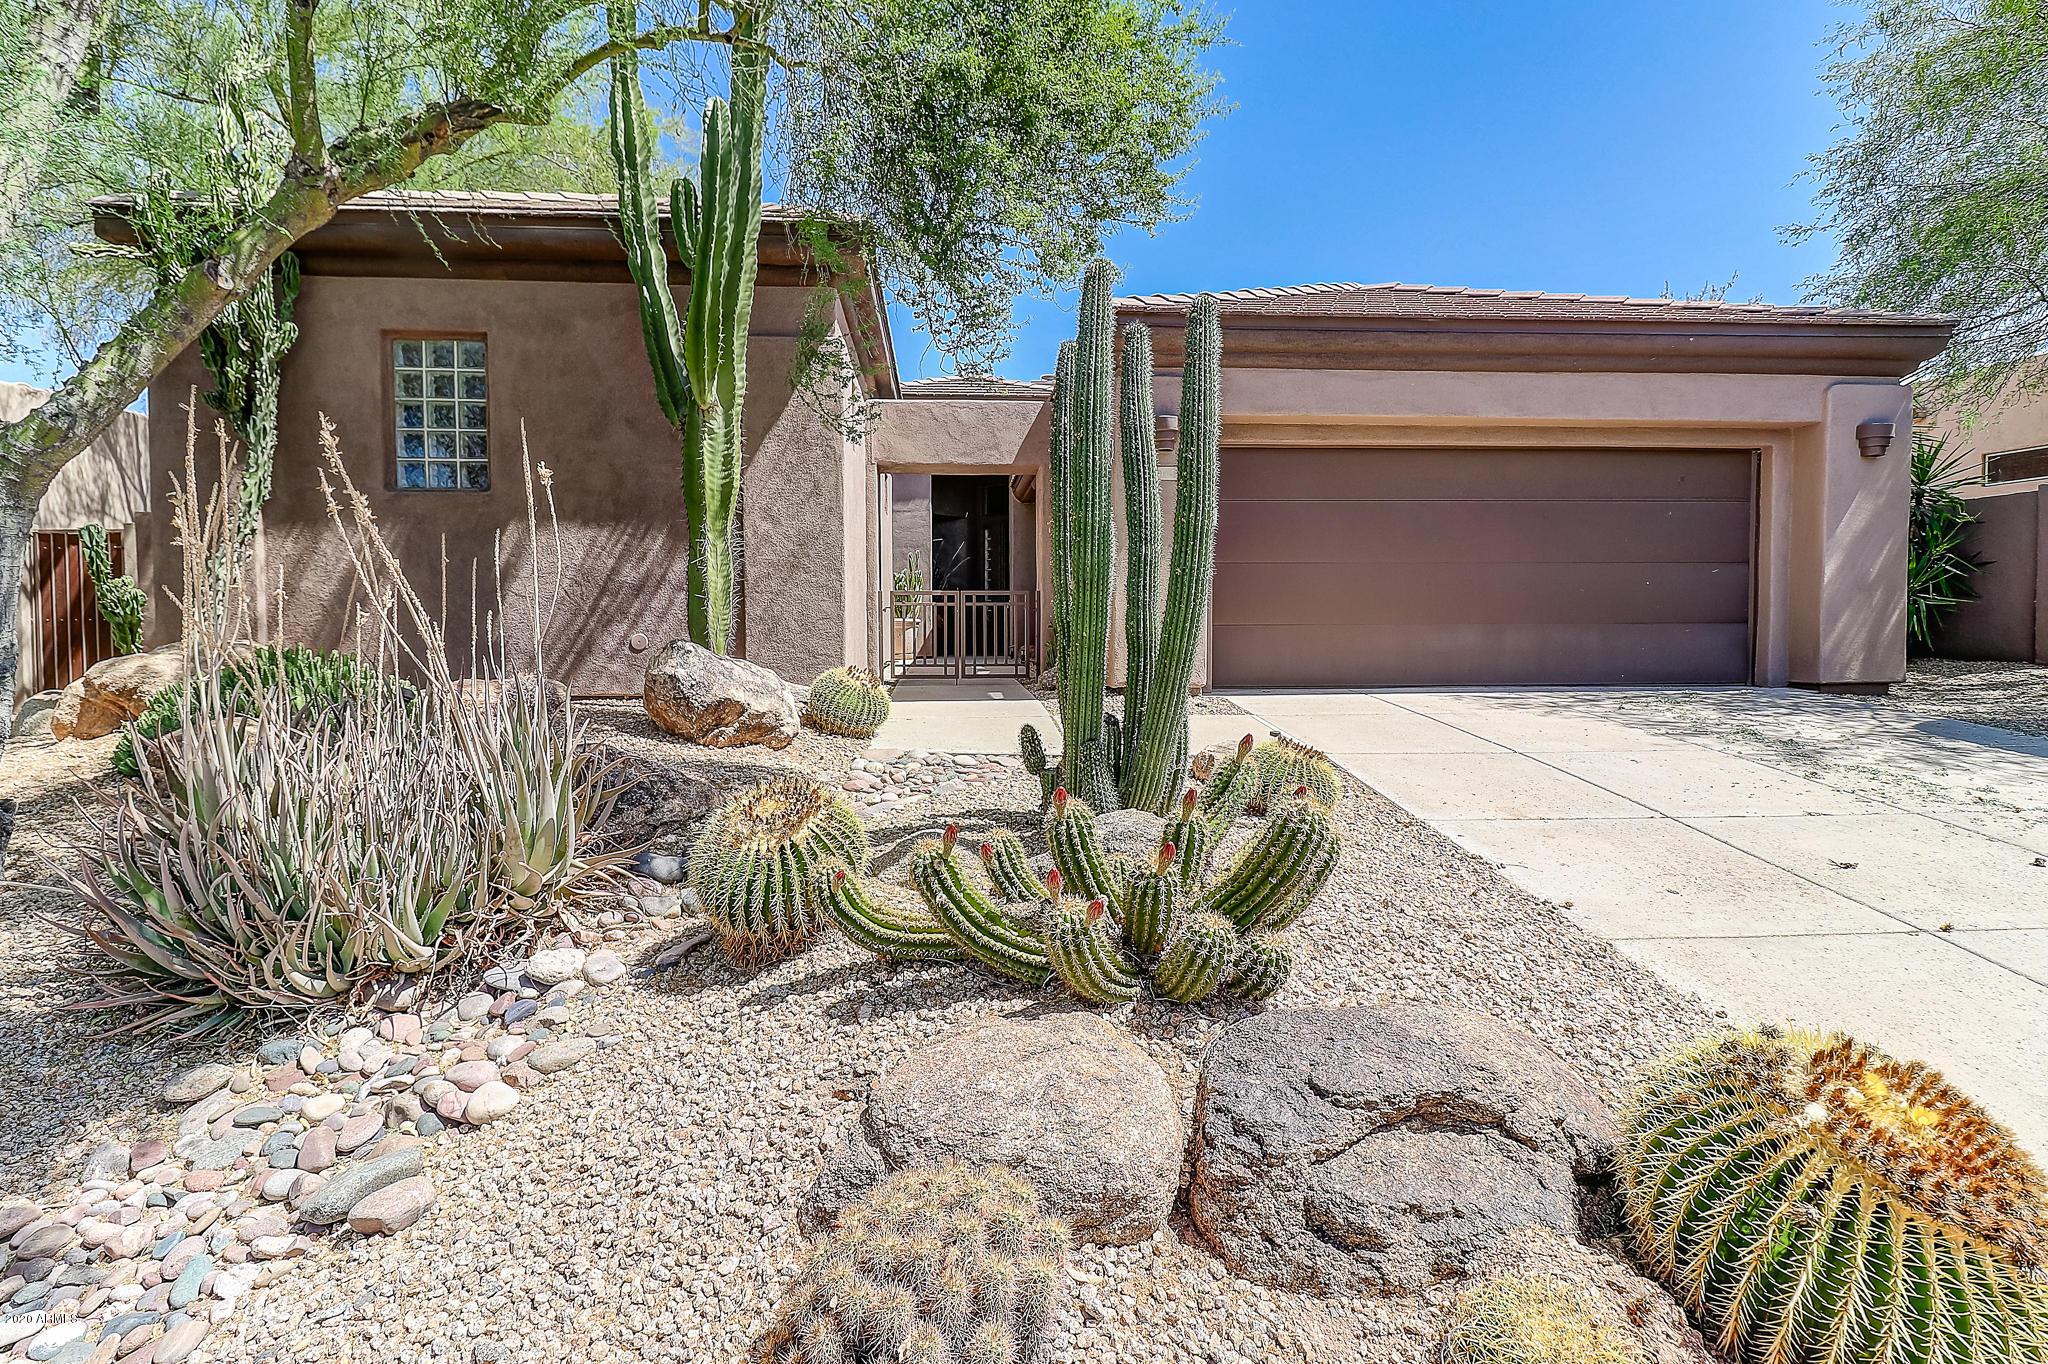 Photo of 6954 E HIBISCUS Way, Scottsdale, AZ 85266